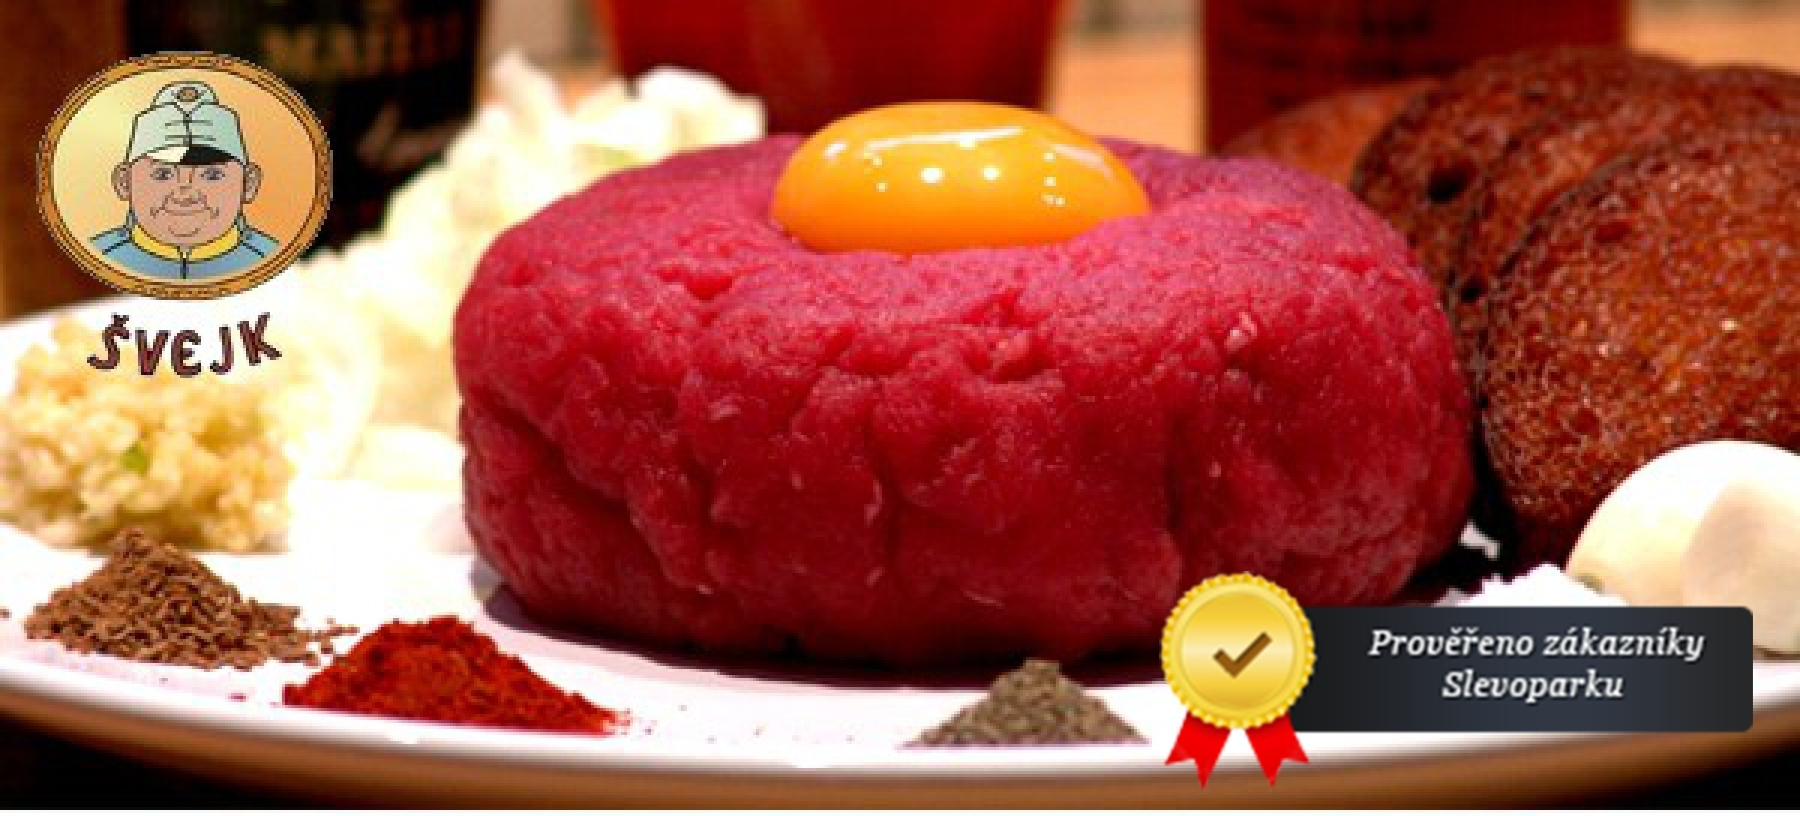 Až 500g tatarského bifteku ve Švejkově restaurantu